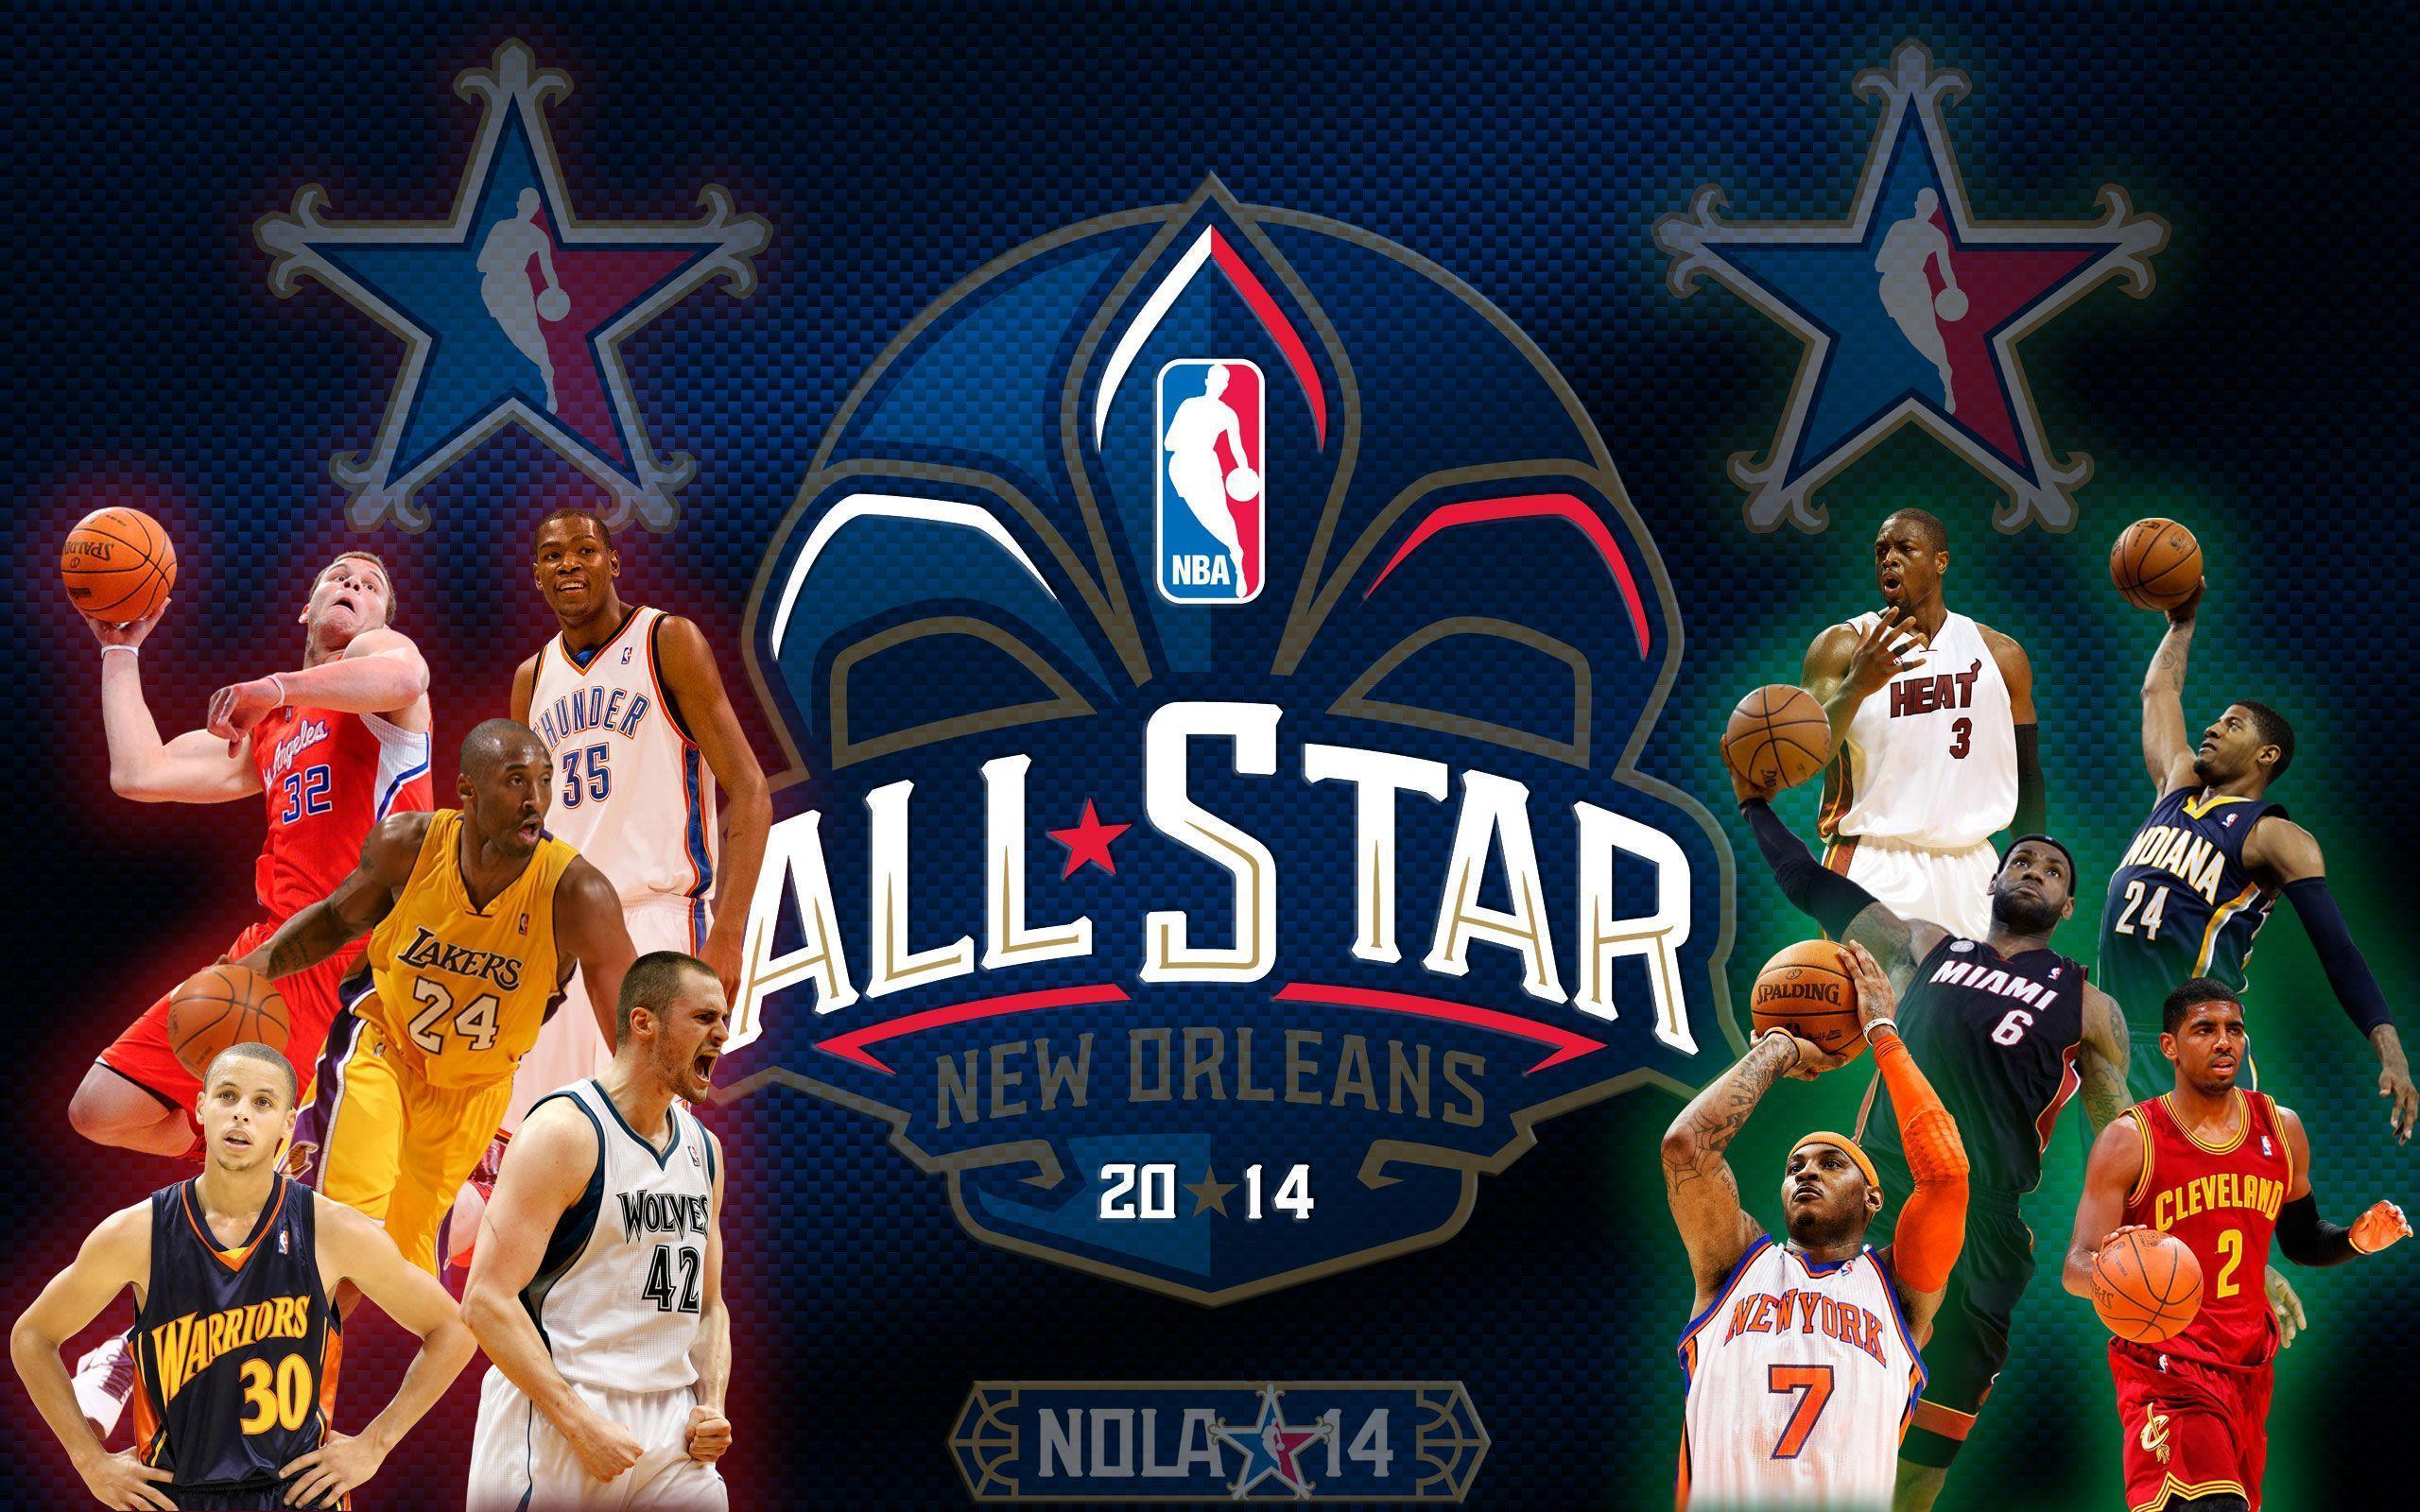 Nba Basketball Wallpapers Top Free Nba Basketball Backgrounds